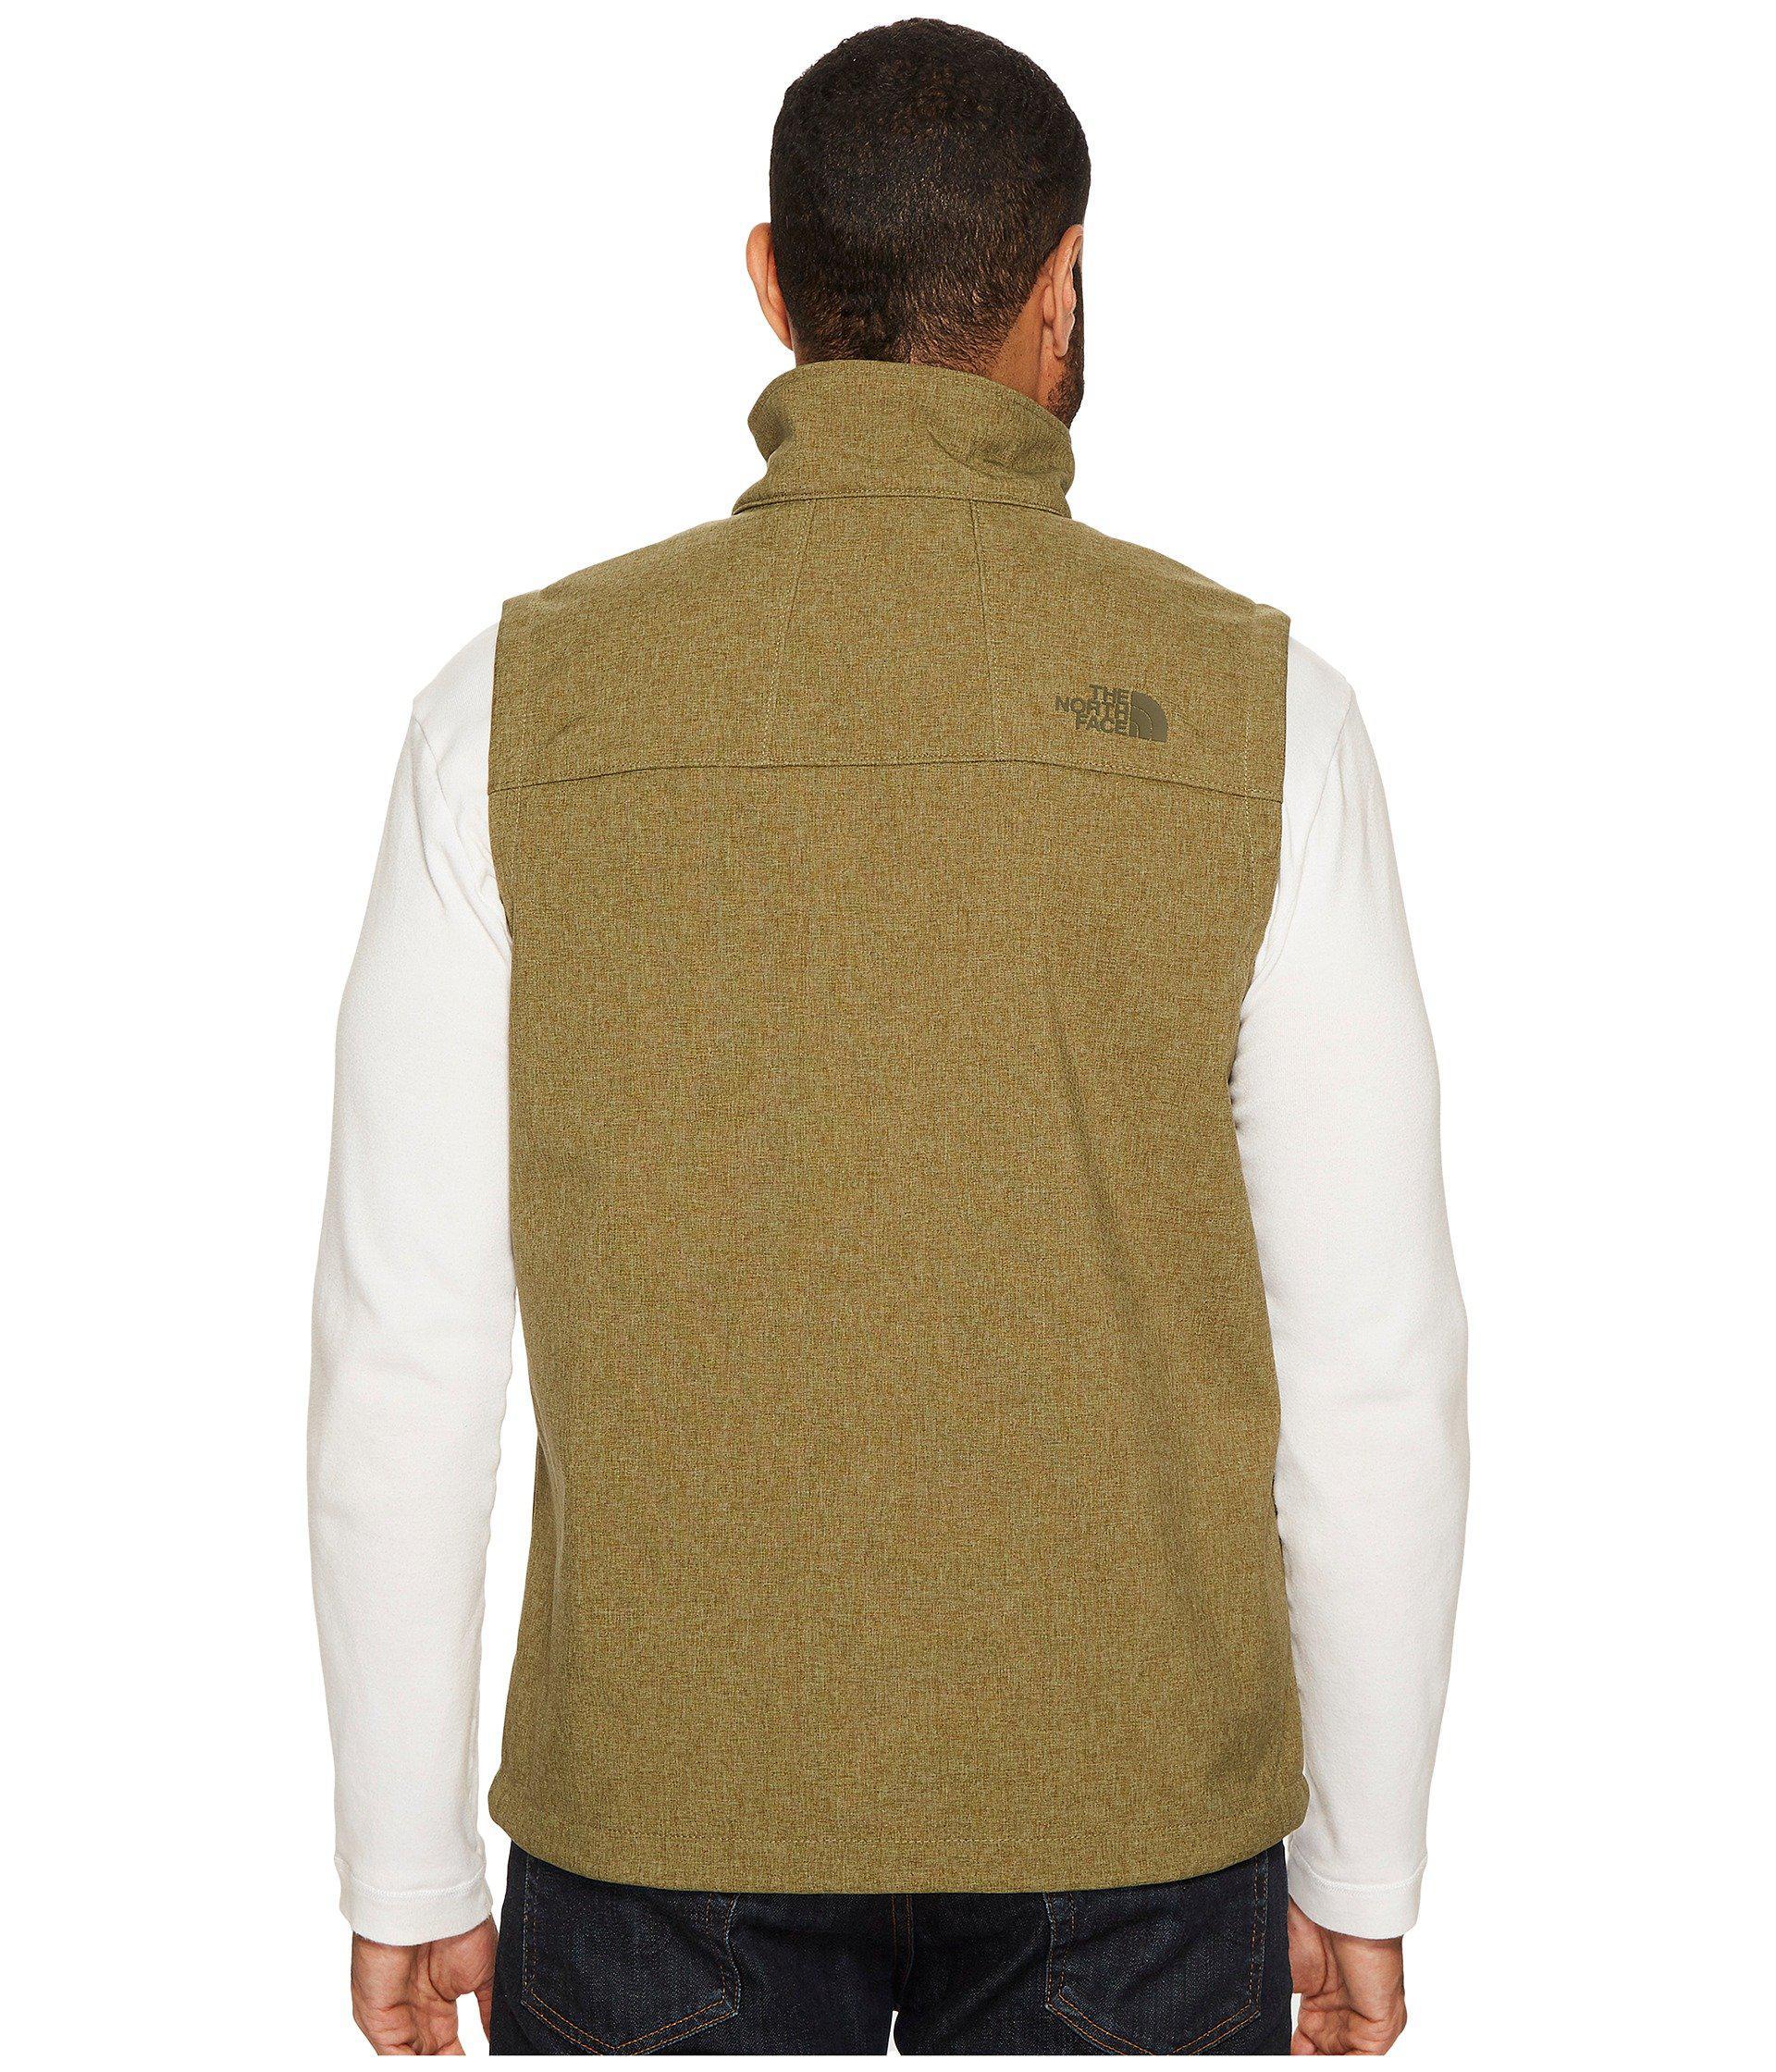 635c6d483ff783 The North Face - Green Apex Bionic 2 Vest for Men - Lyst. View fullscreen